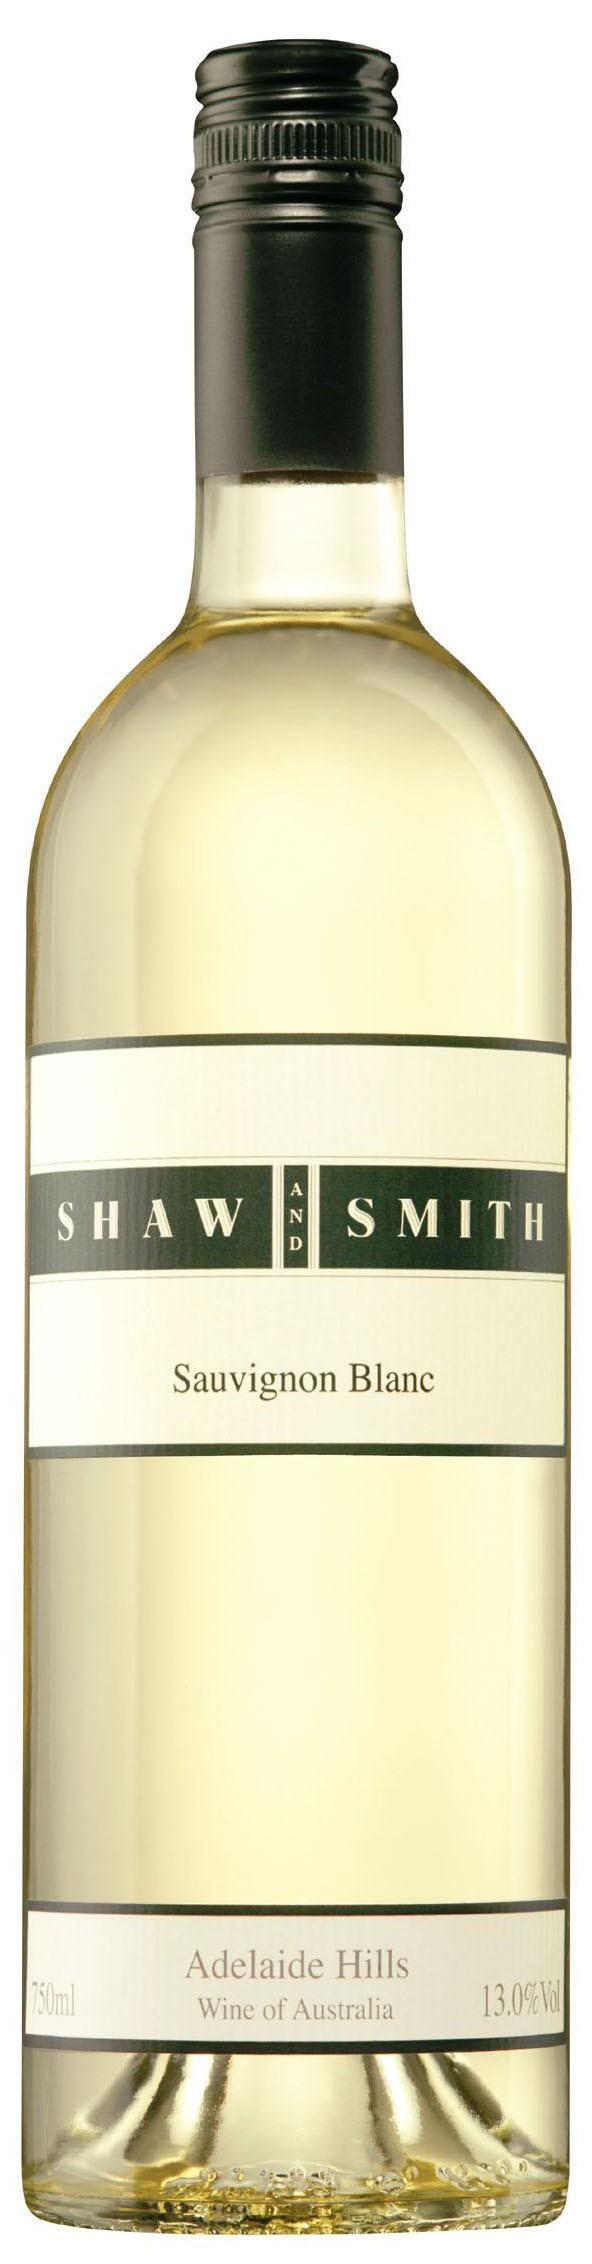 Shaw & Smith Sauv Blanc 750ml